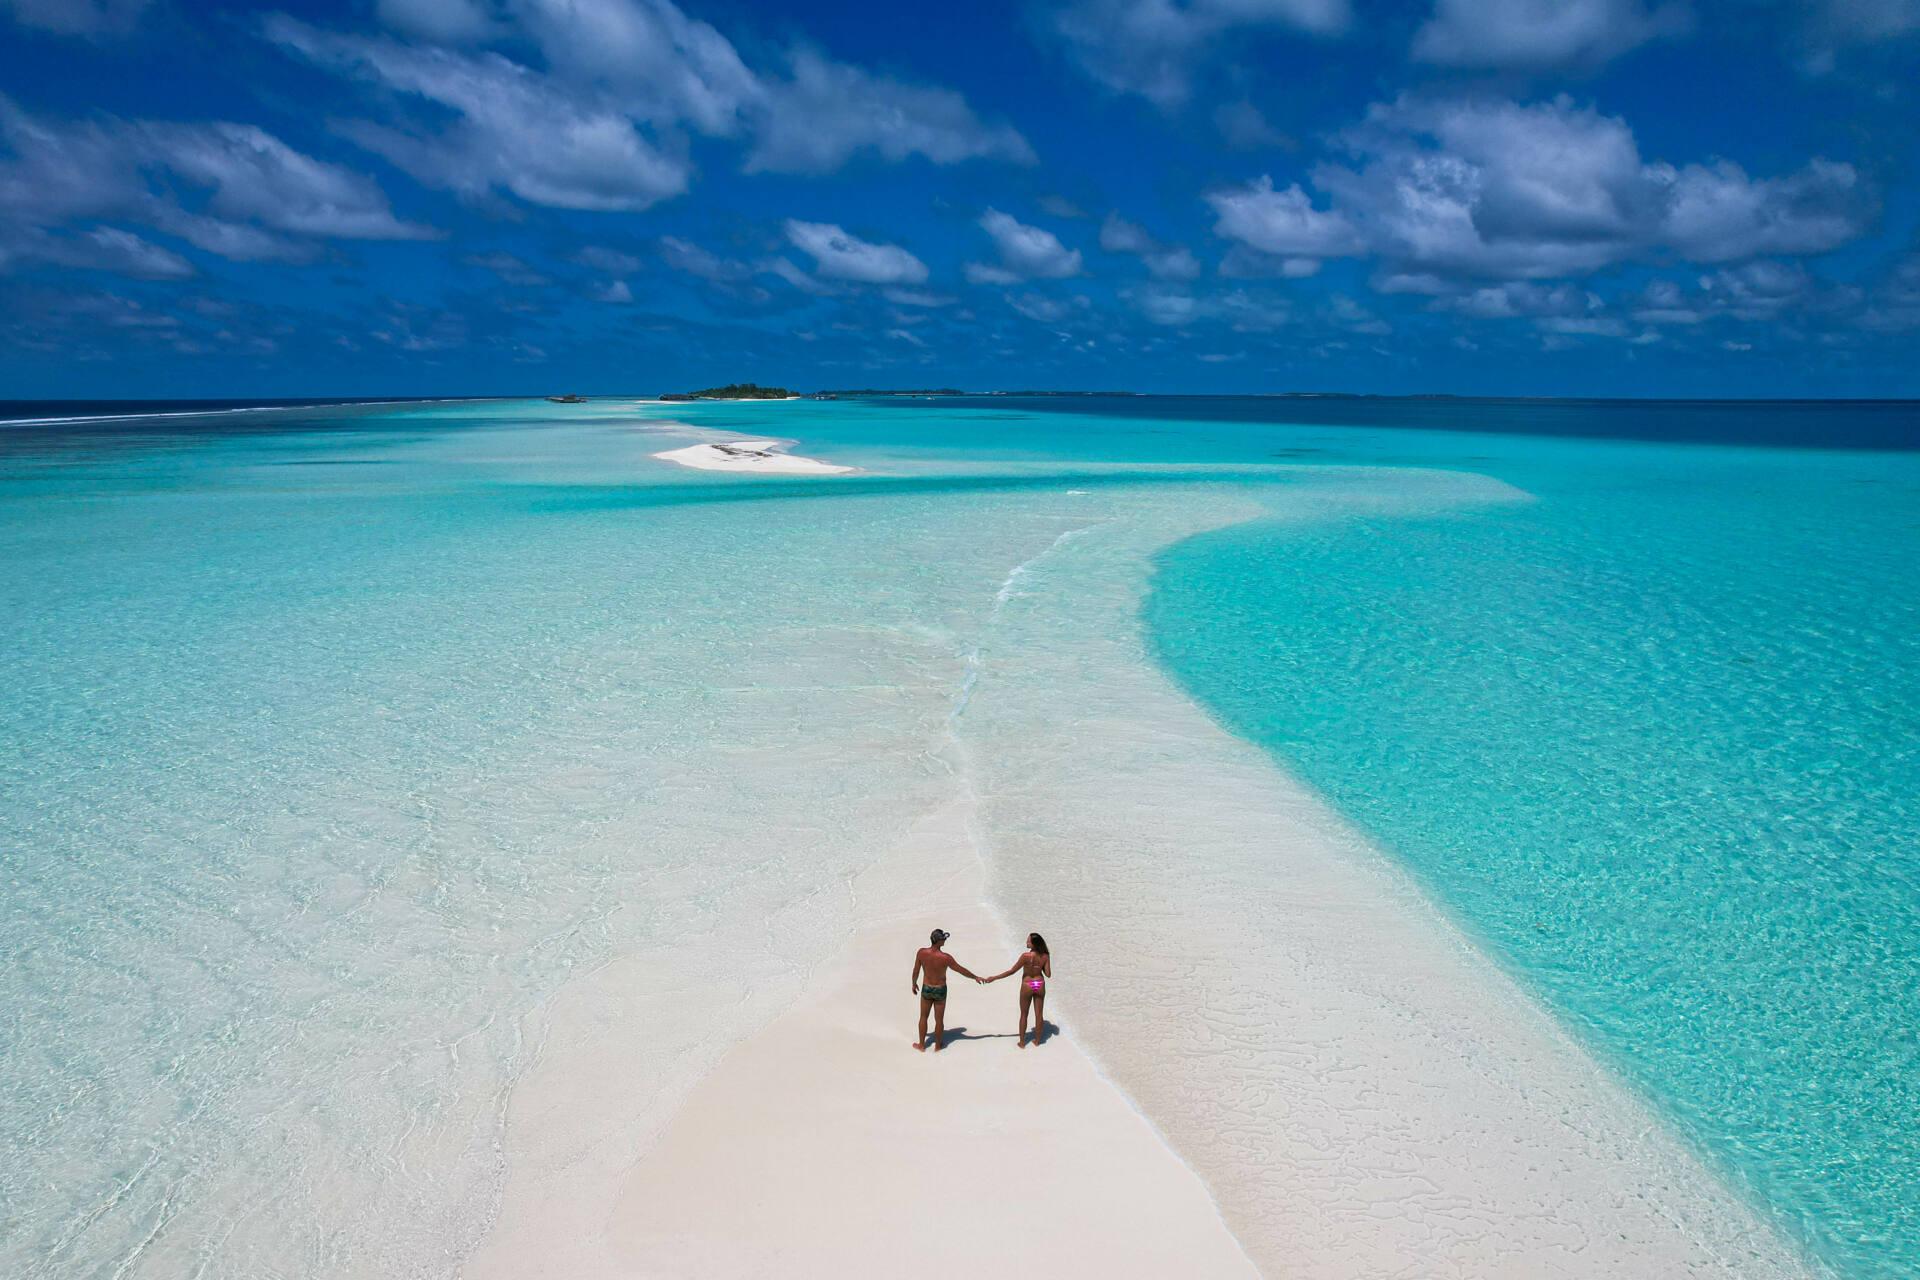 Dhigurah - Ilhas Maldivas